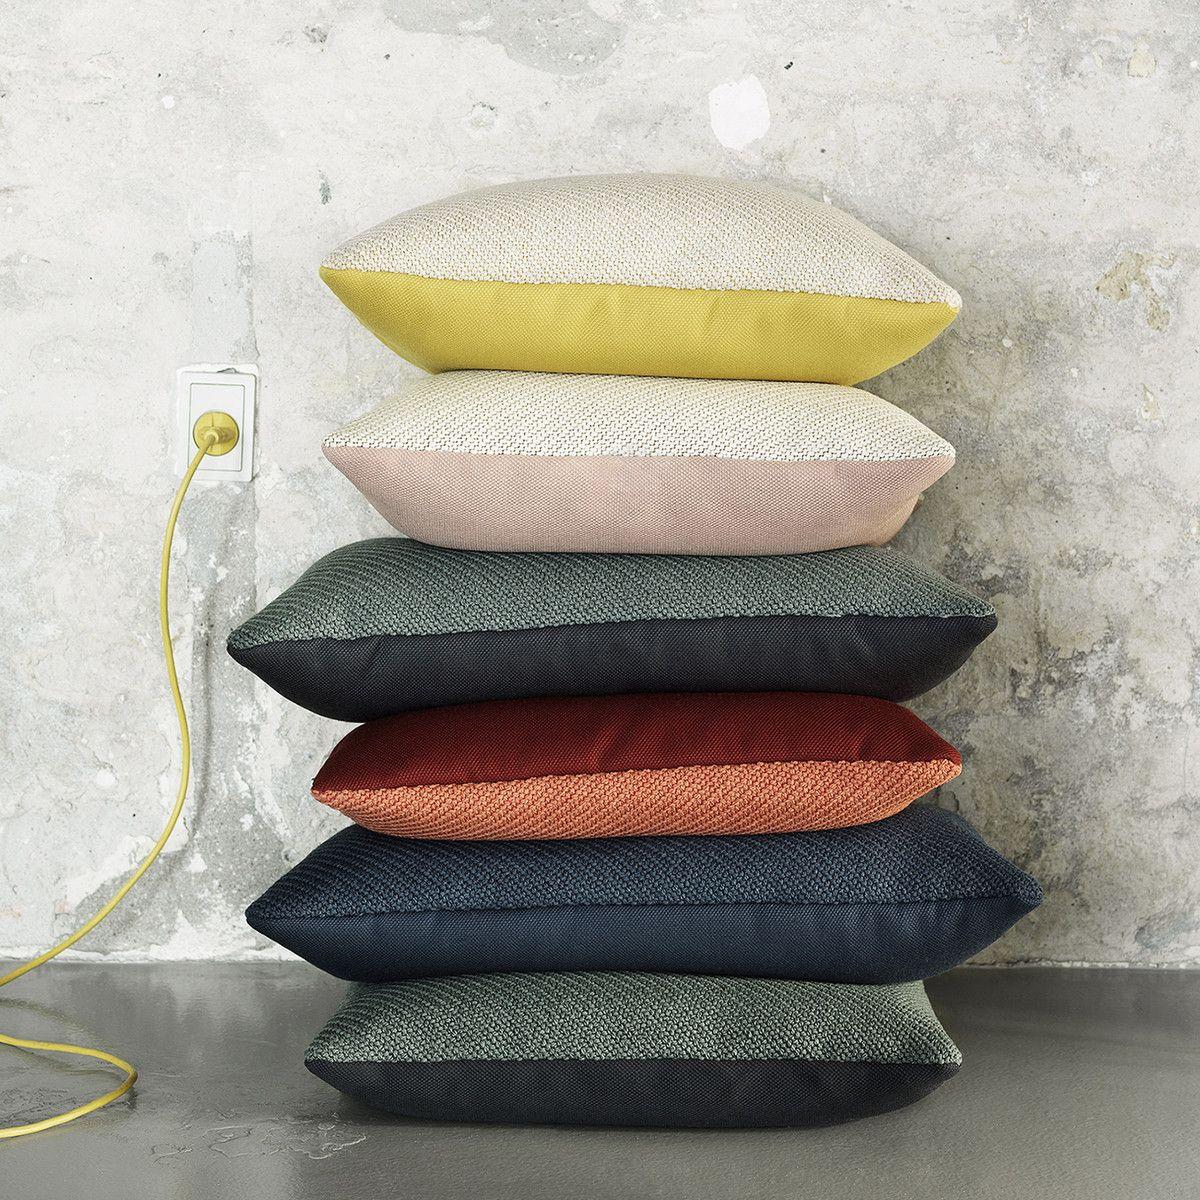 Wohndesign Skandinavien: Muuto - Mingle Kissen, 50 X 50 Cm, Gelb